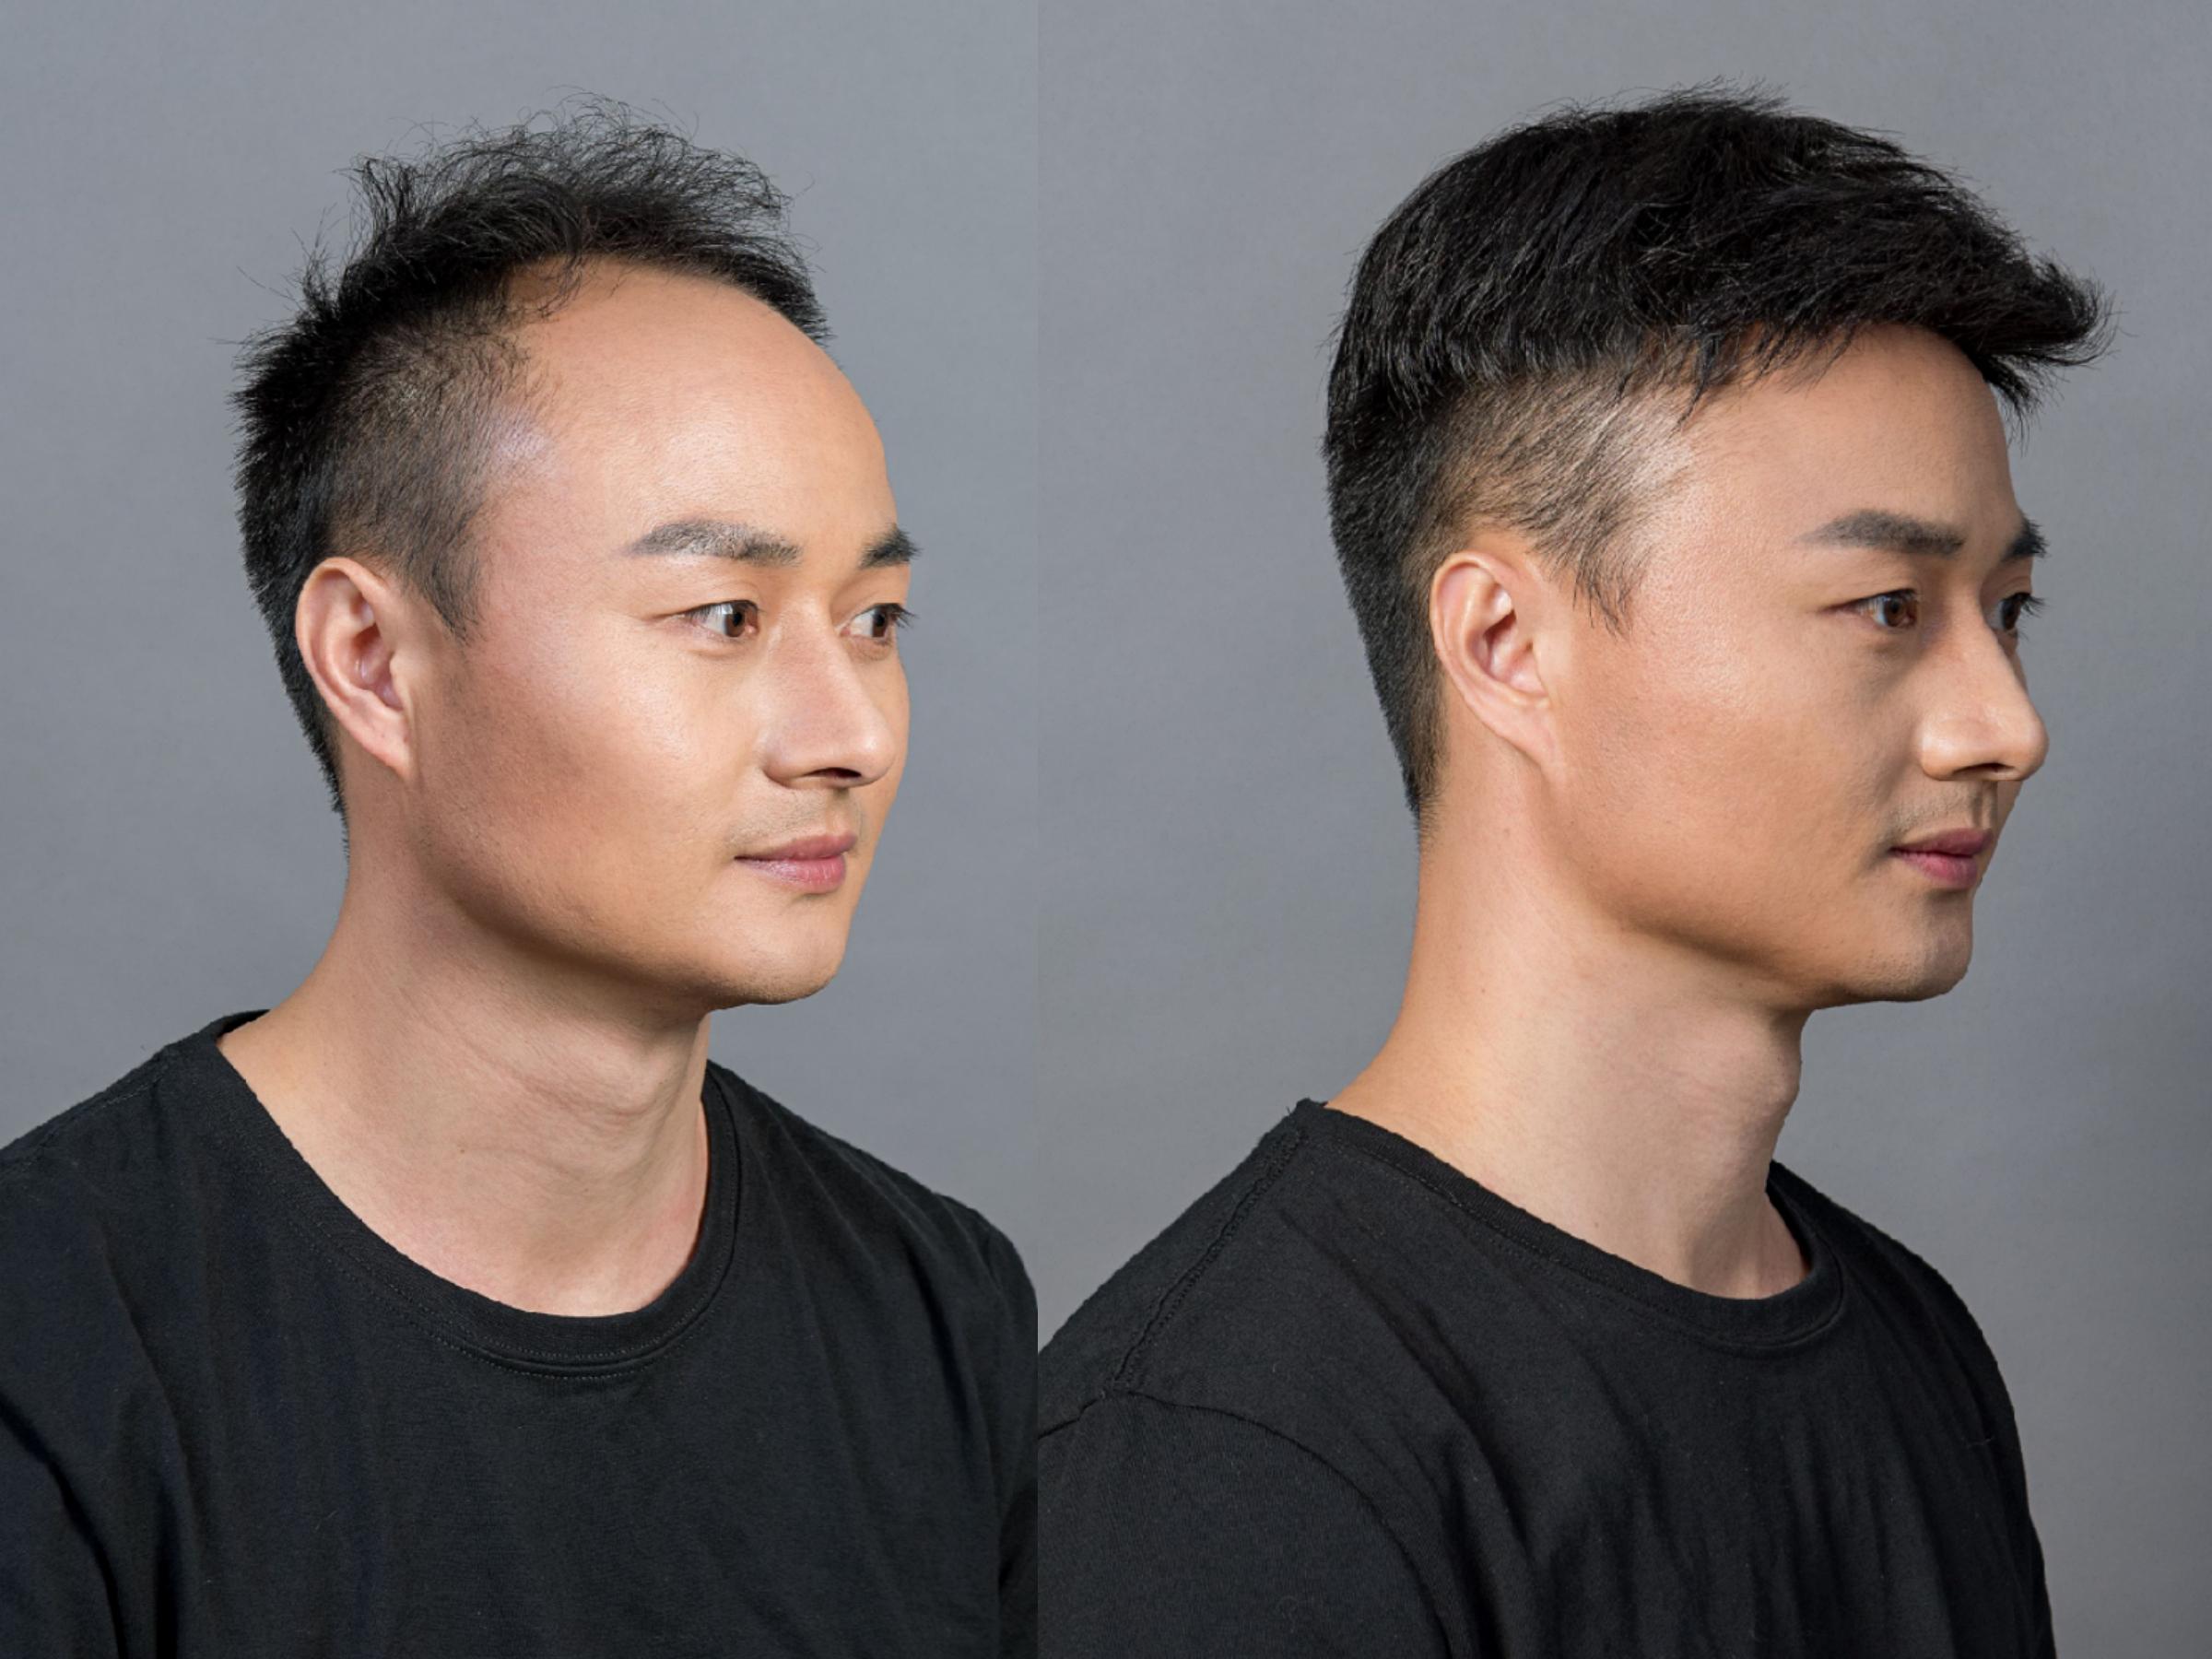 men's hair styles